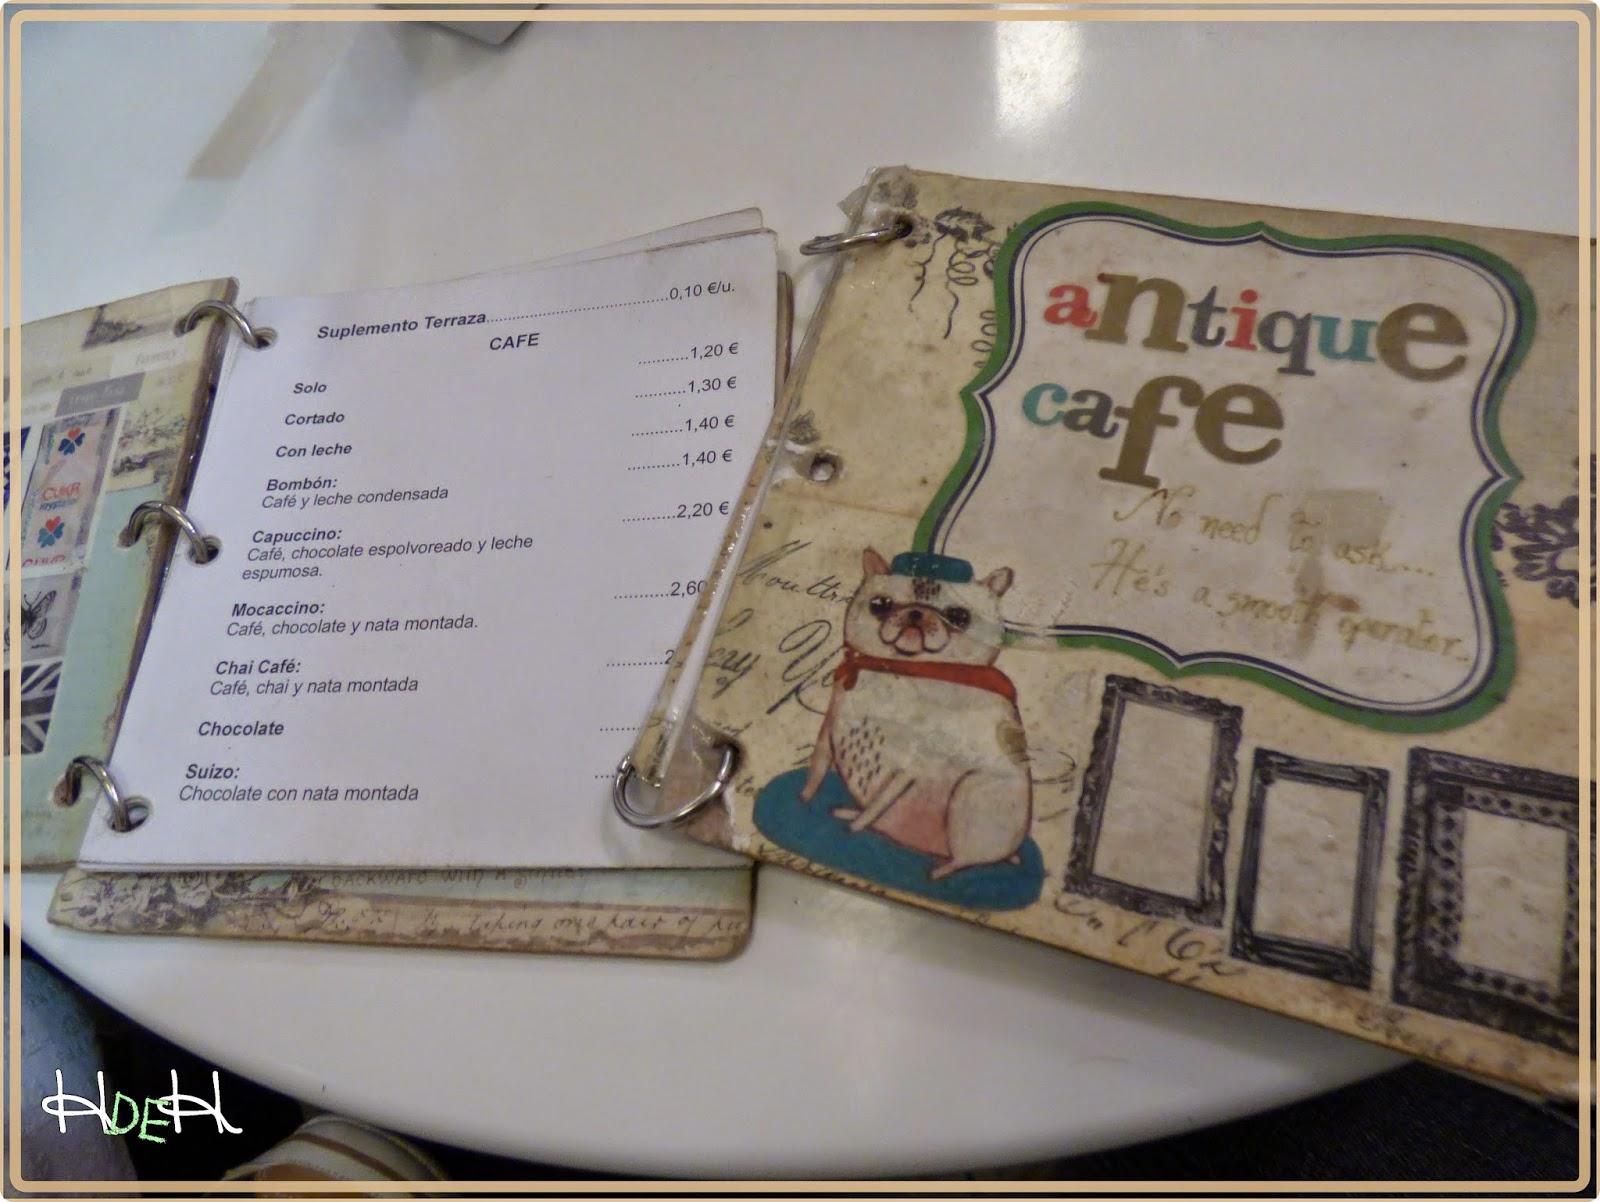 antique cafe valencia